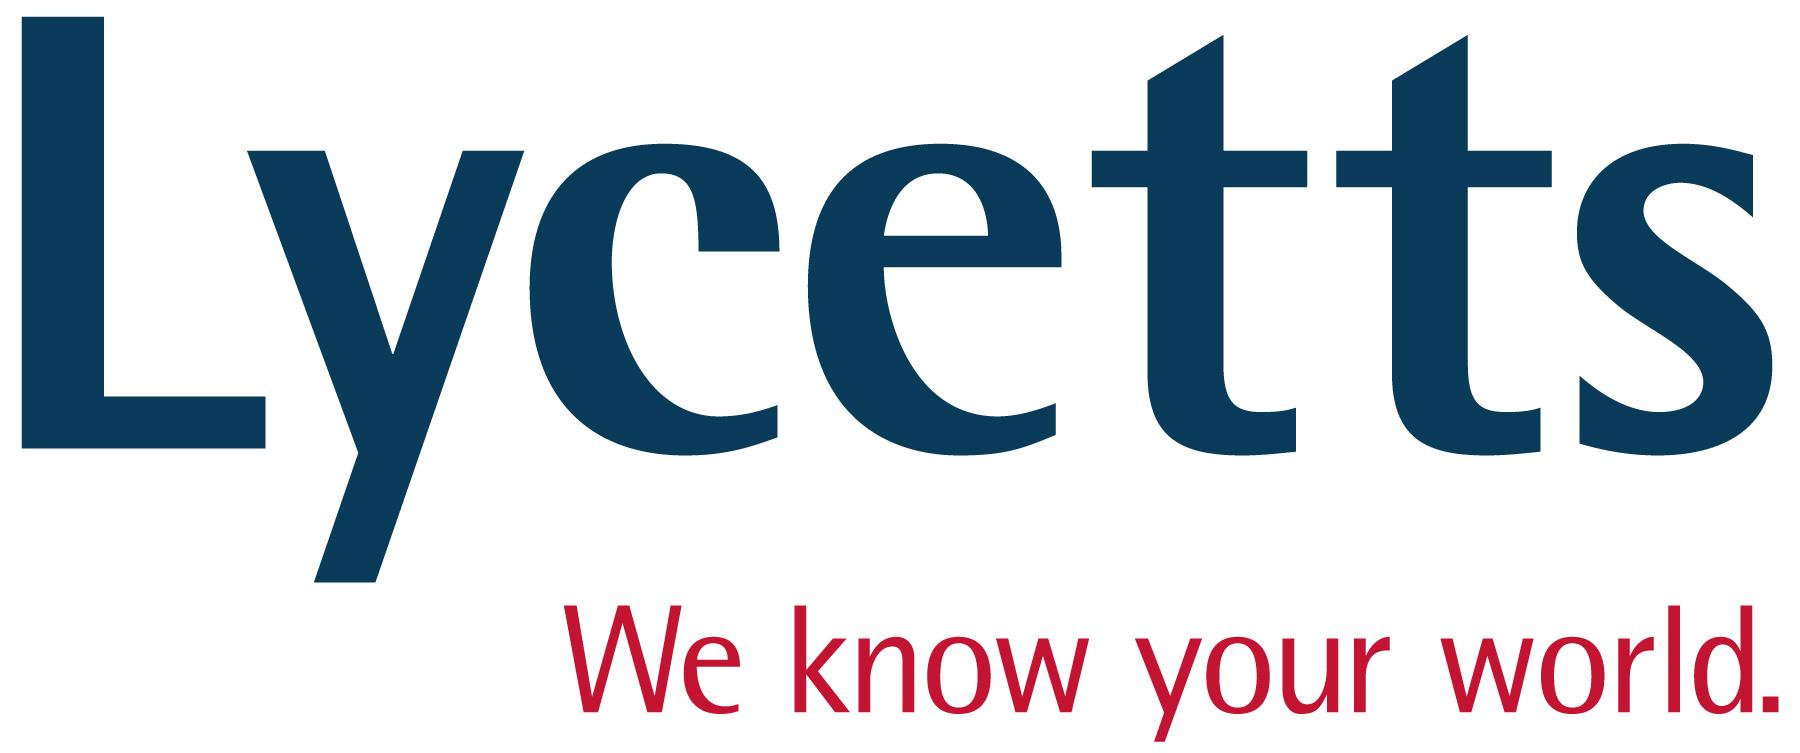 Lycetts sponsor the Beaufort Hunt Team Chase